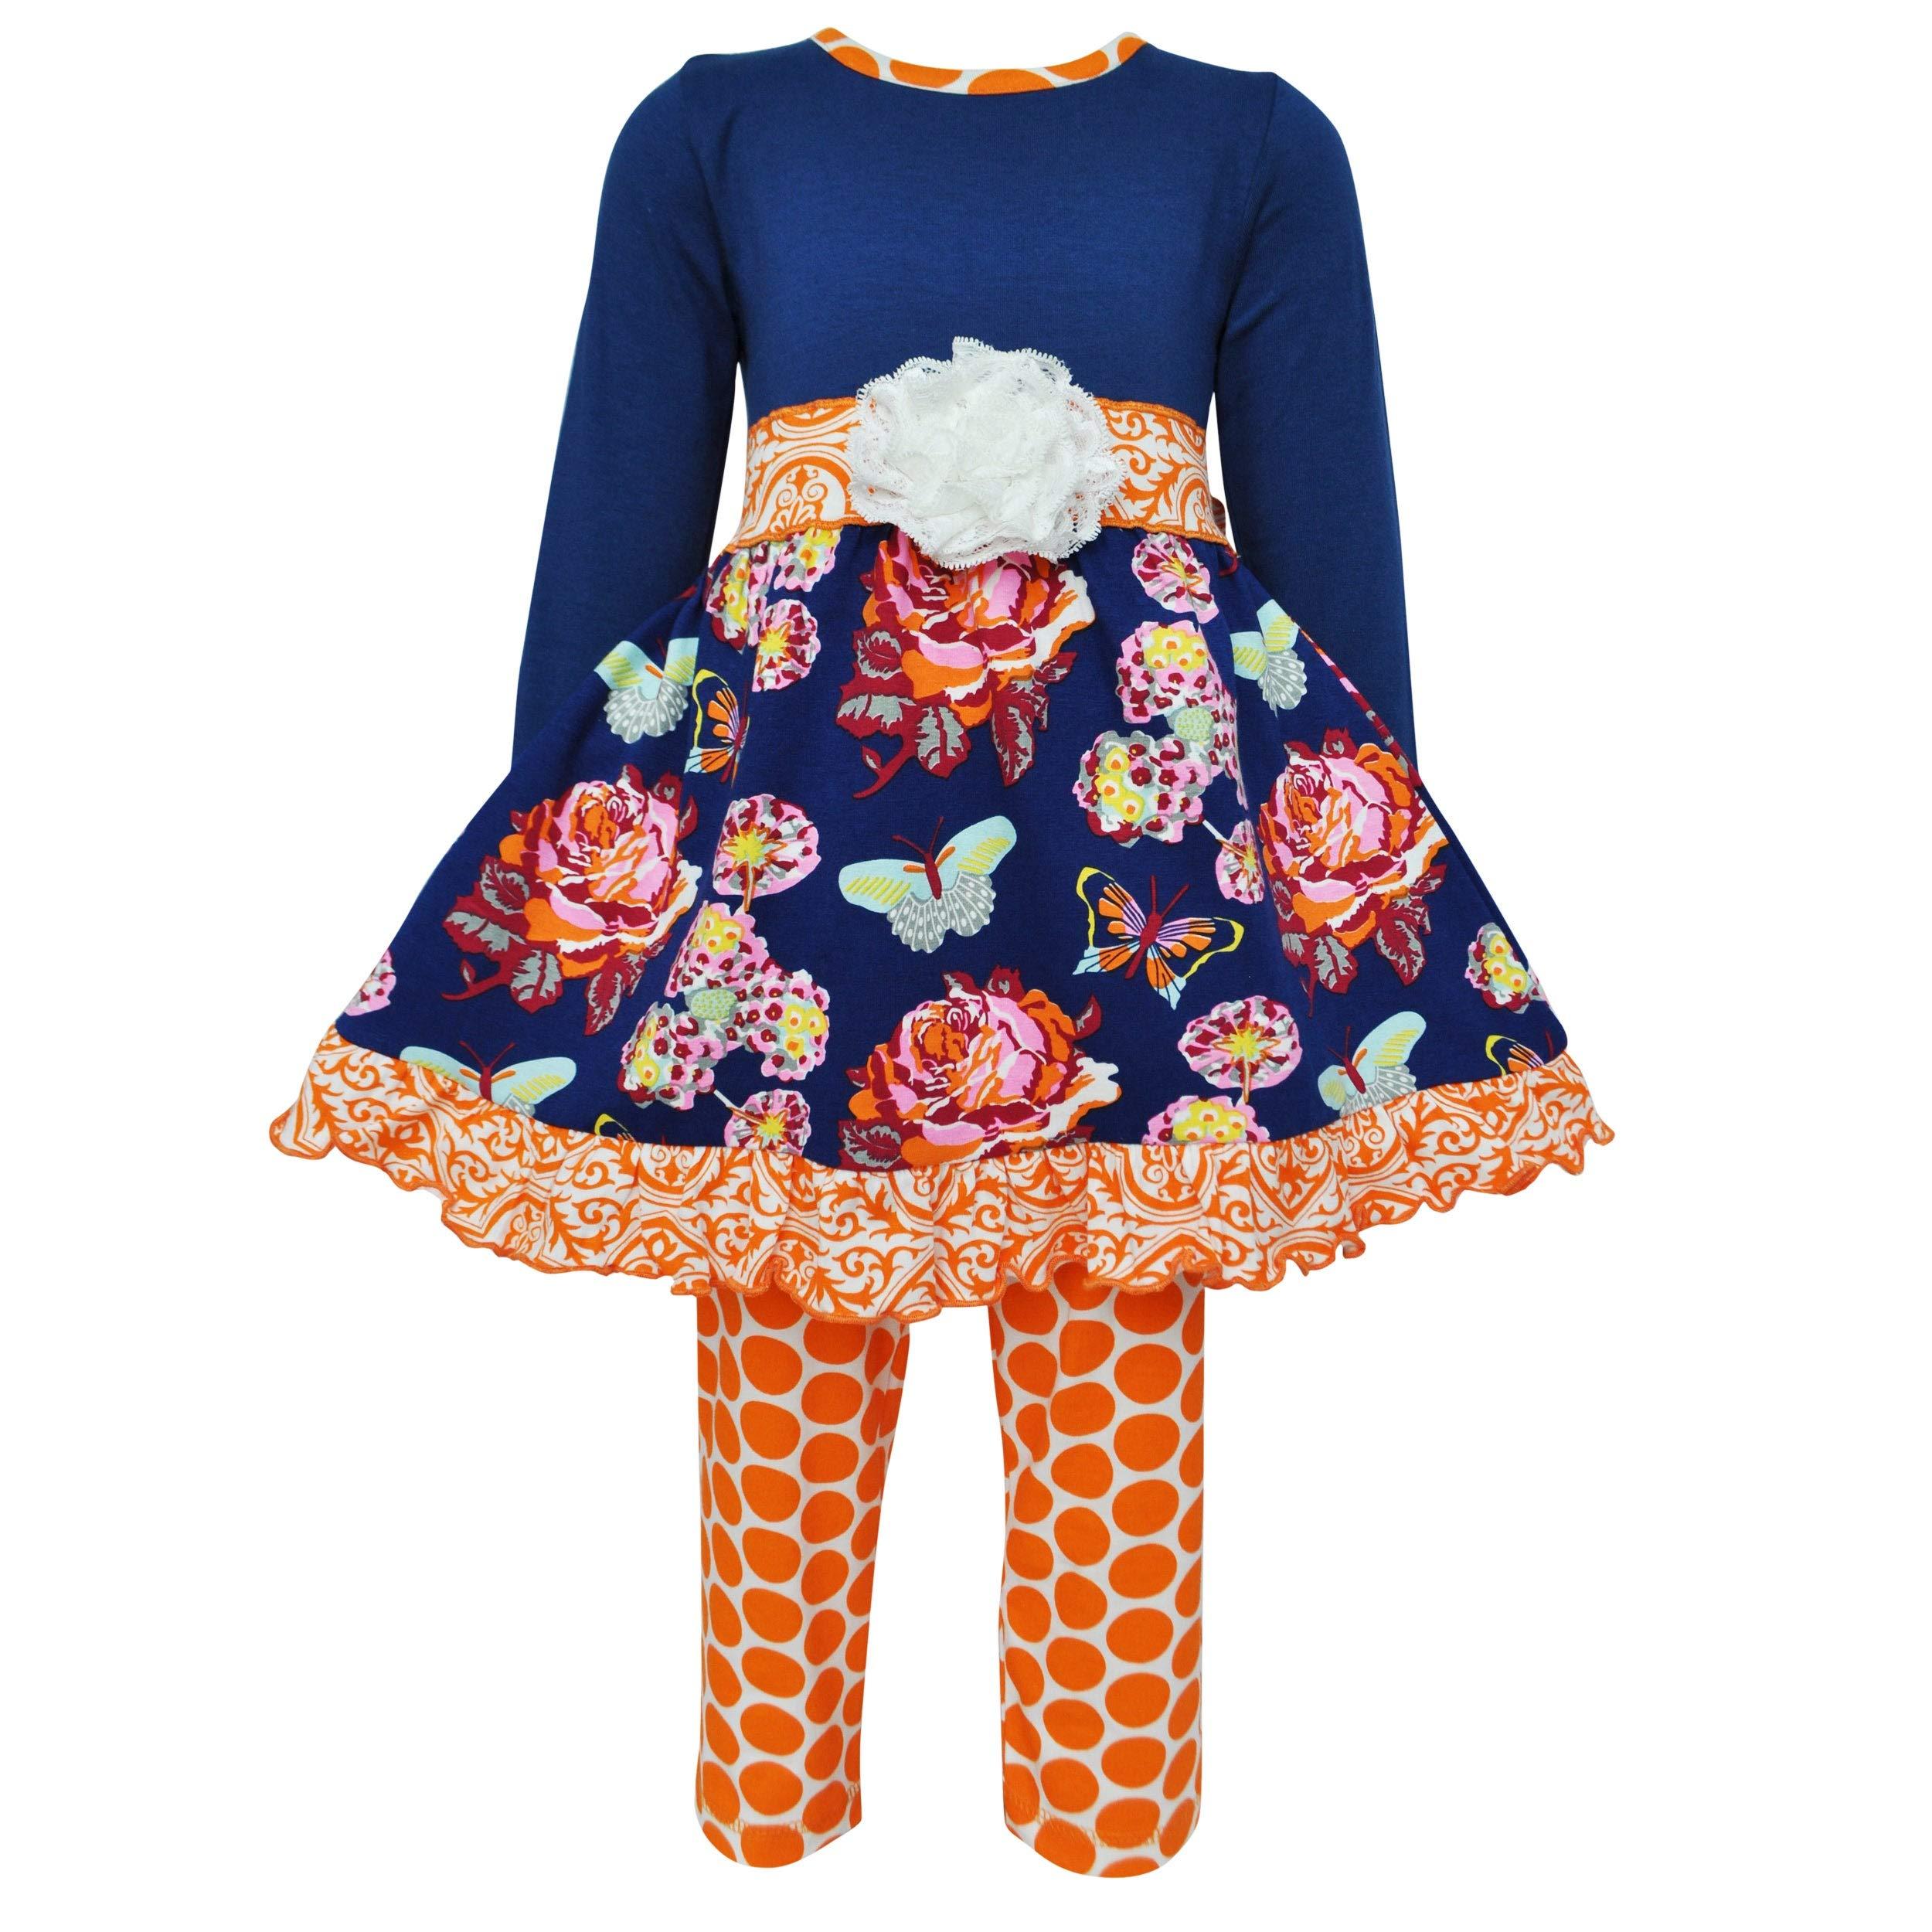 AnnLoren Girls Boutique Cotton Spandex Floral Dress & Pants Holiday Outfit (7/8, Blue/Orange) by AnnLoren